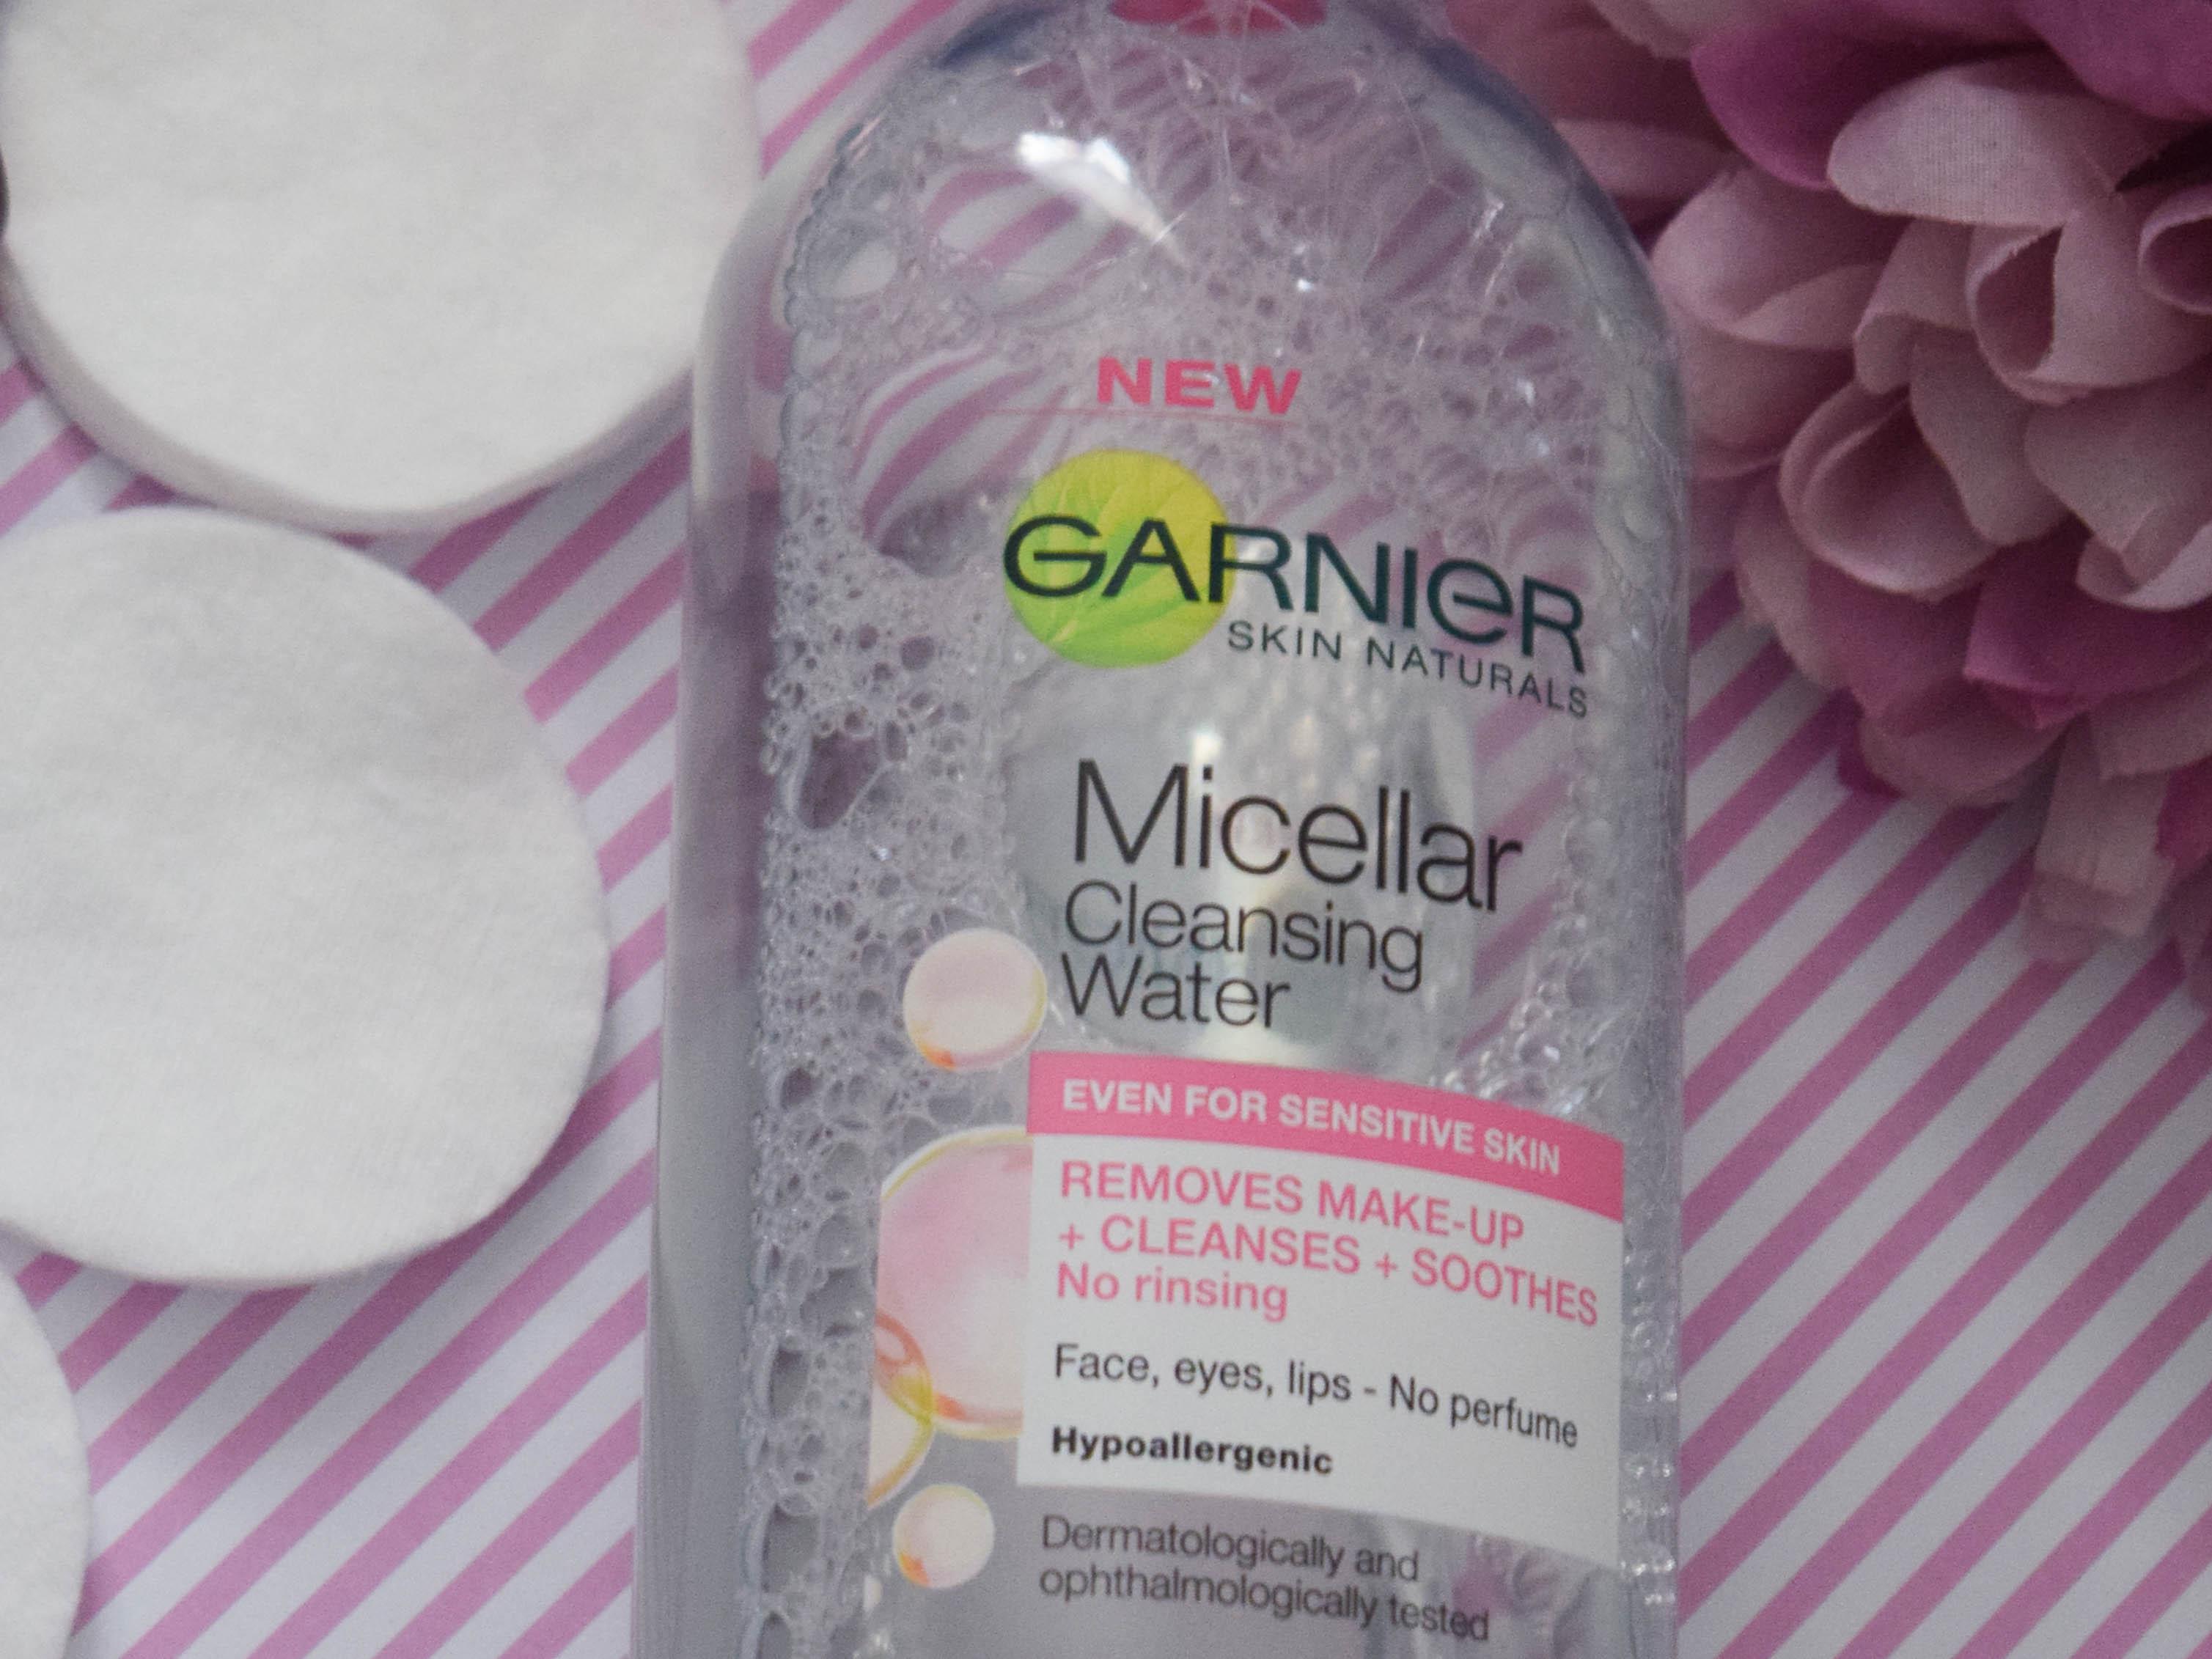 Ganier Micellar Cleansing Water